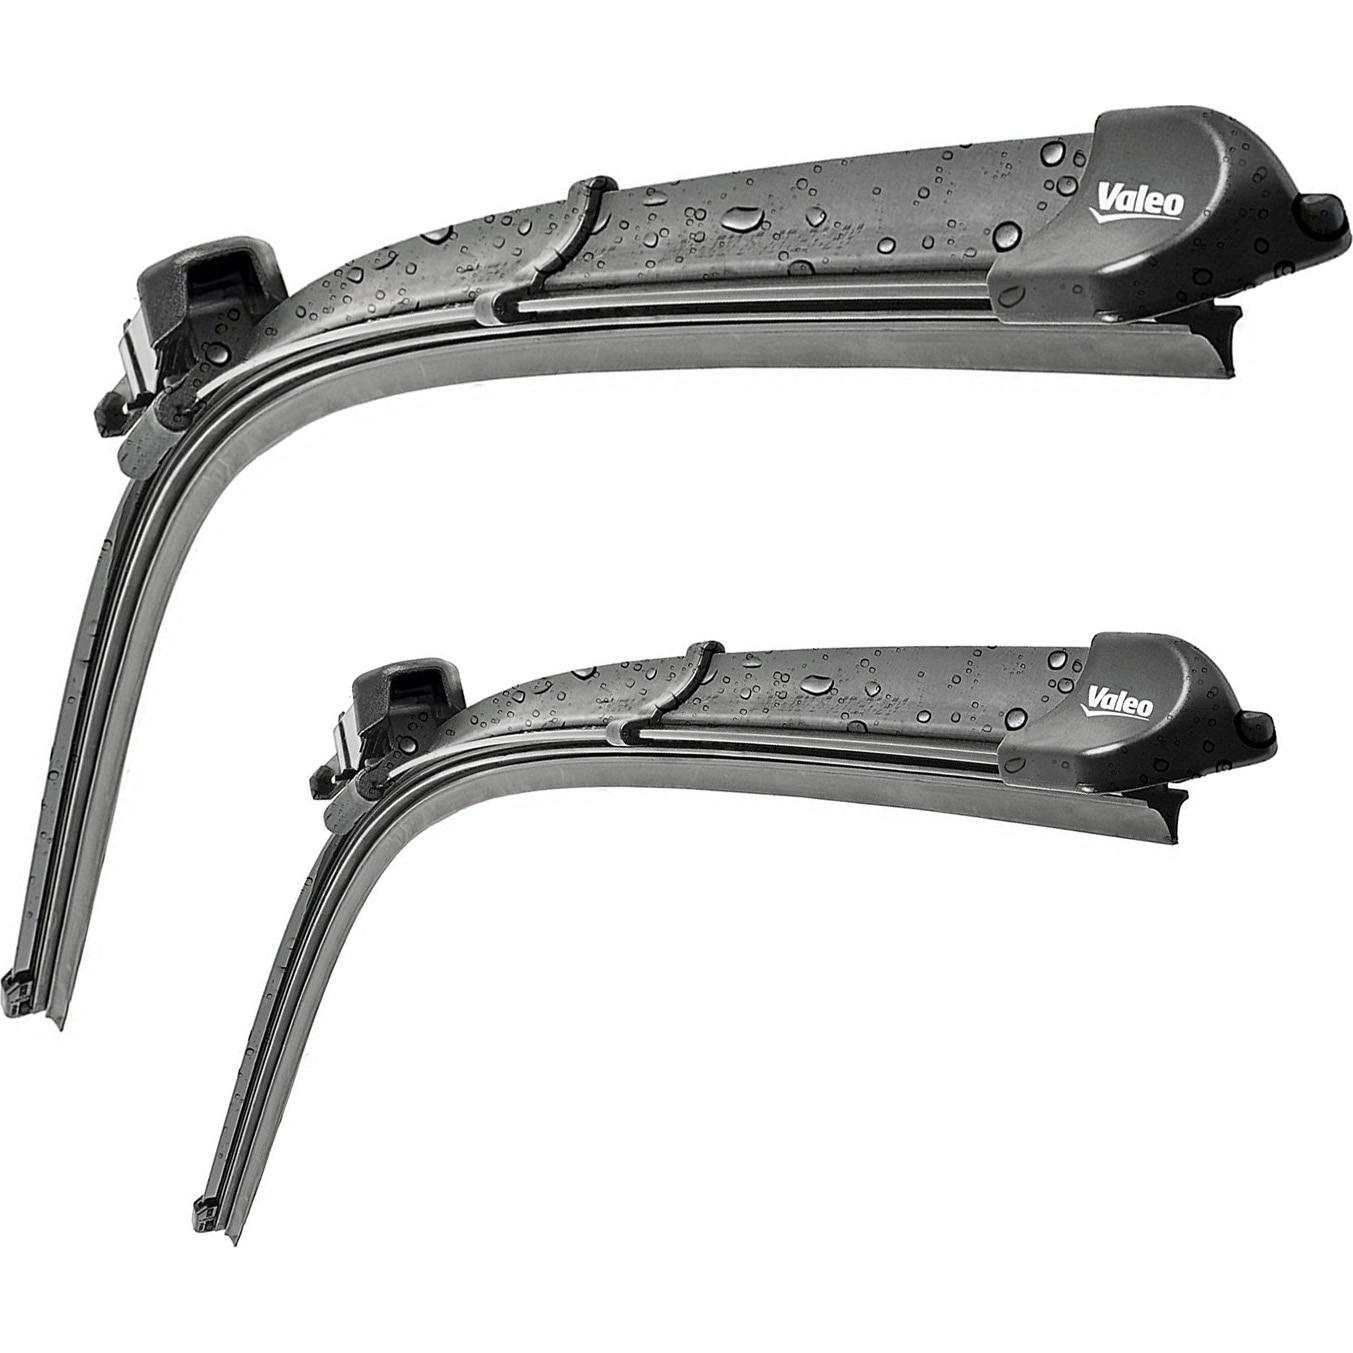 Fotografie Set stergatoare Valeo Silencio X.TRM Flat Blade pentru parbriz 65/60 cm VW Crafter Mercedes Sprinter